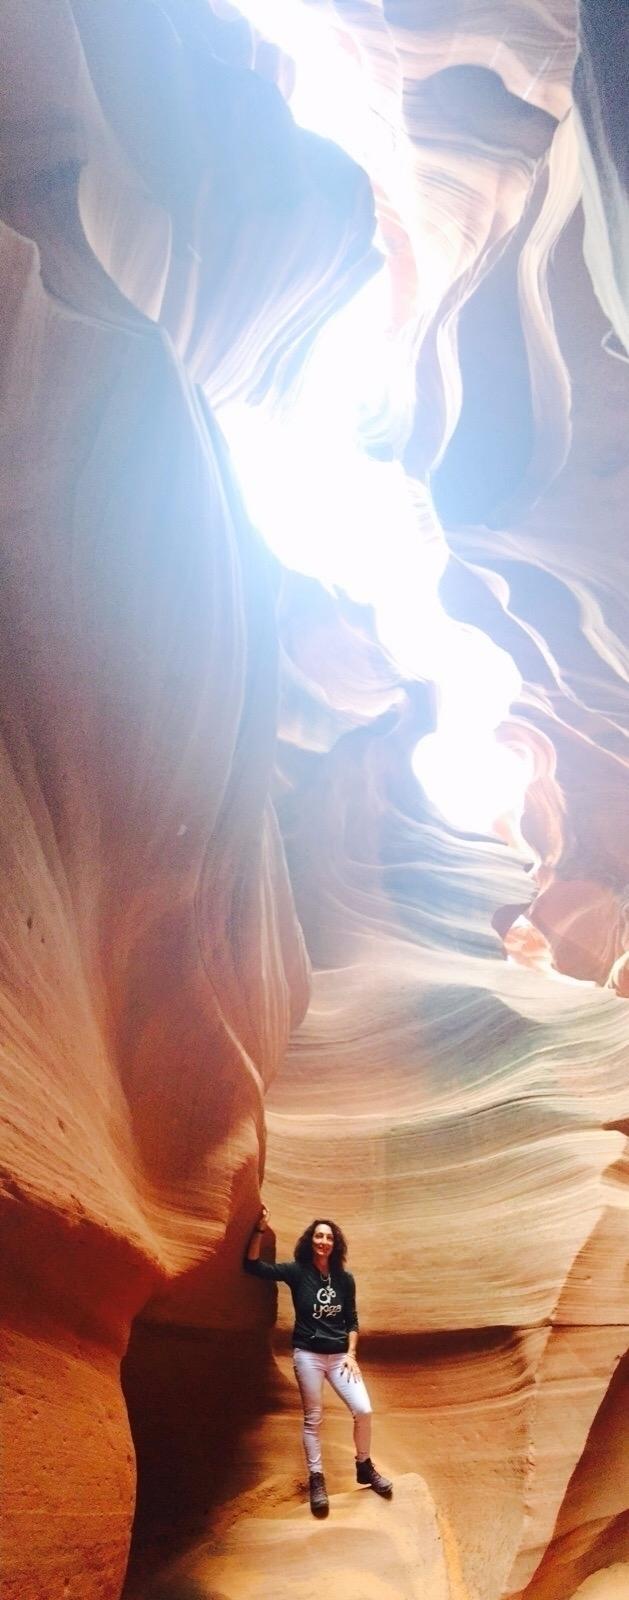 Antelope Canyon, AZ - antelopecanyon - nagel4vegas | ello